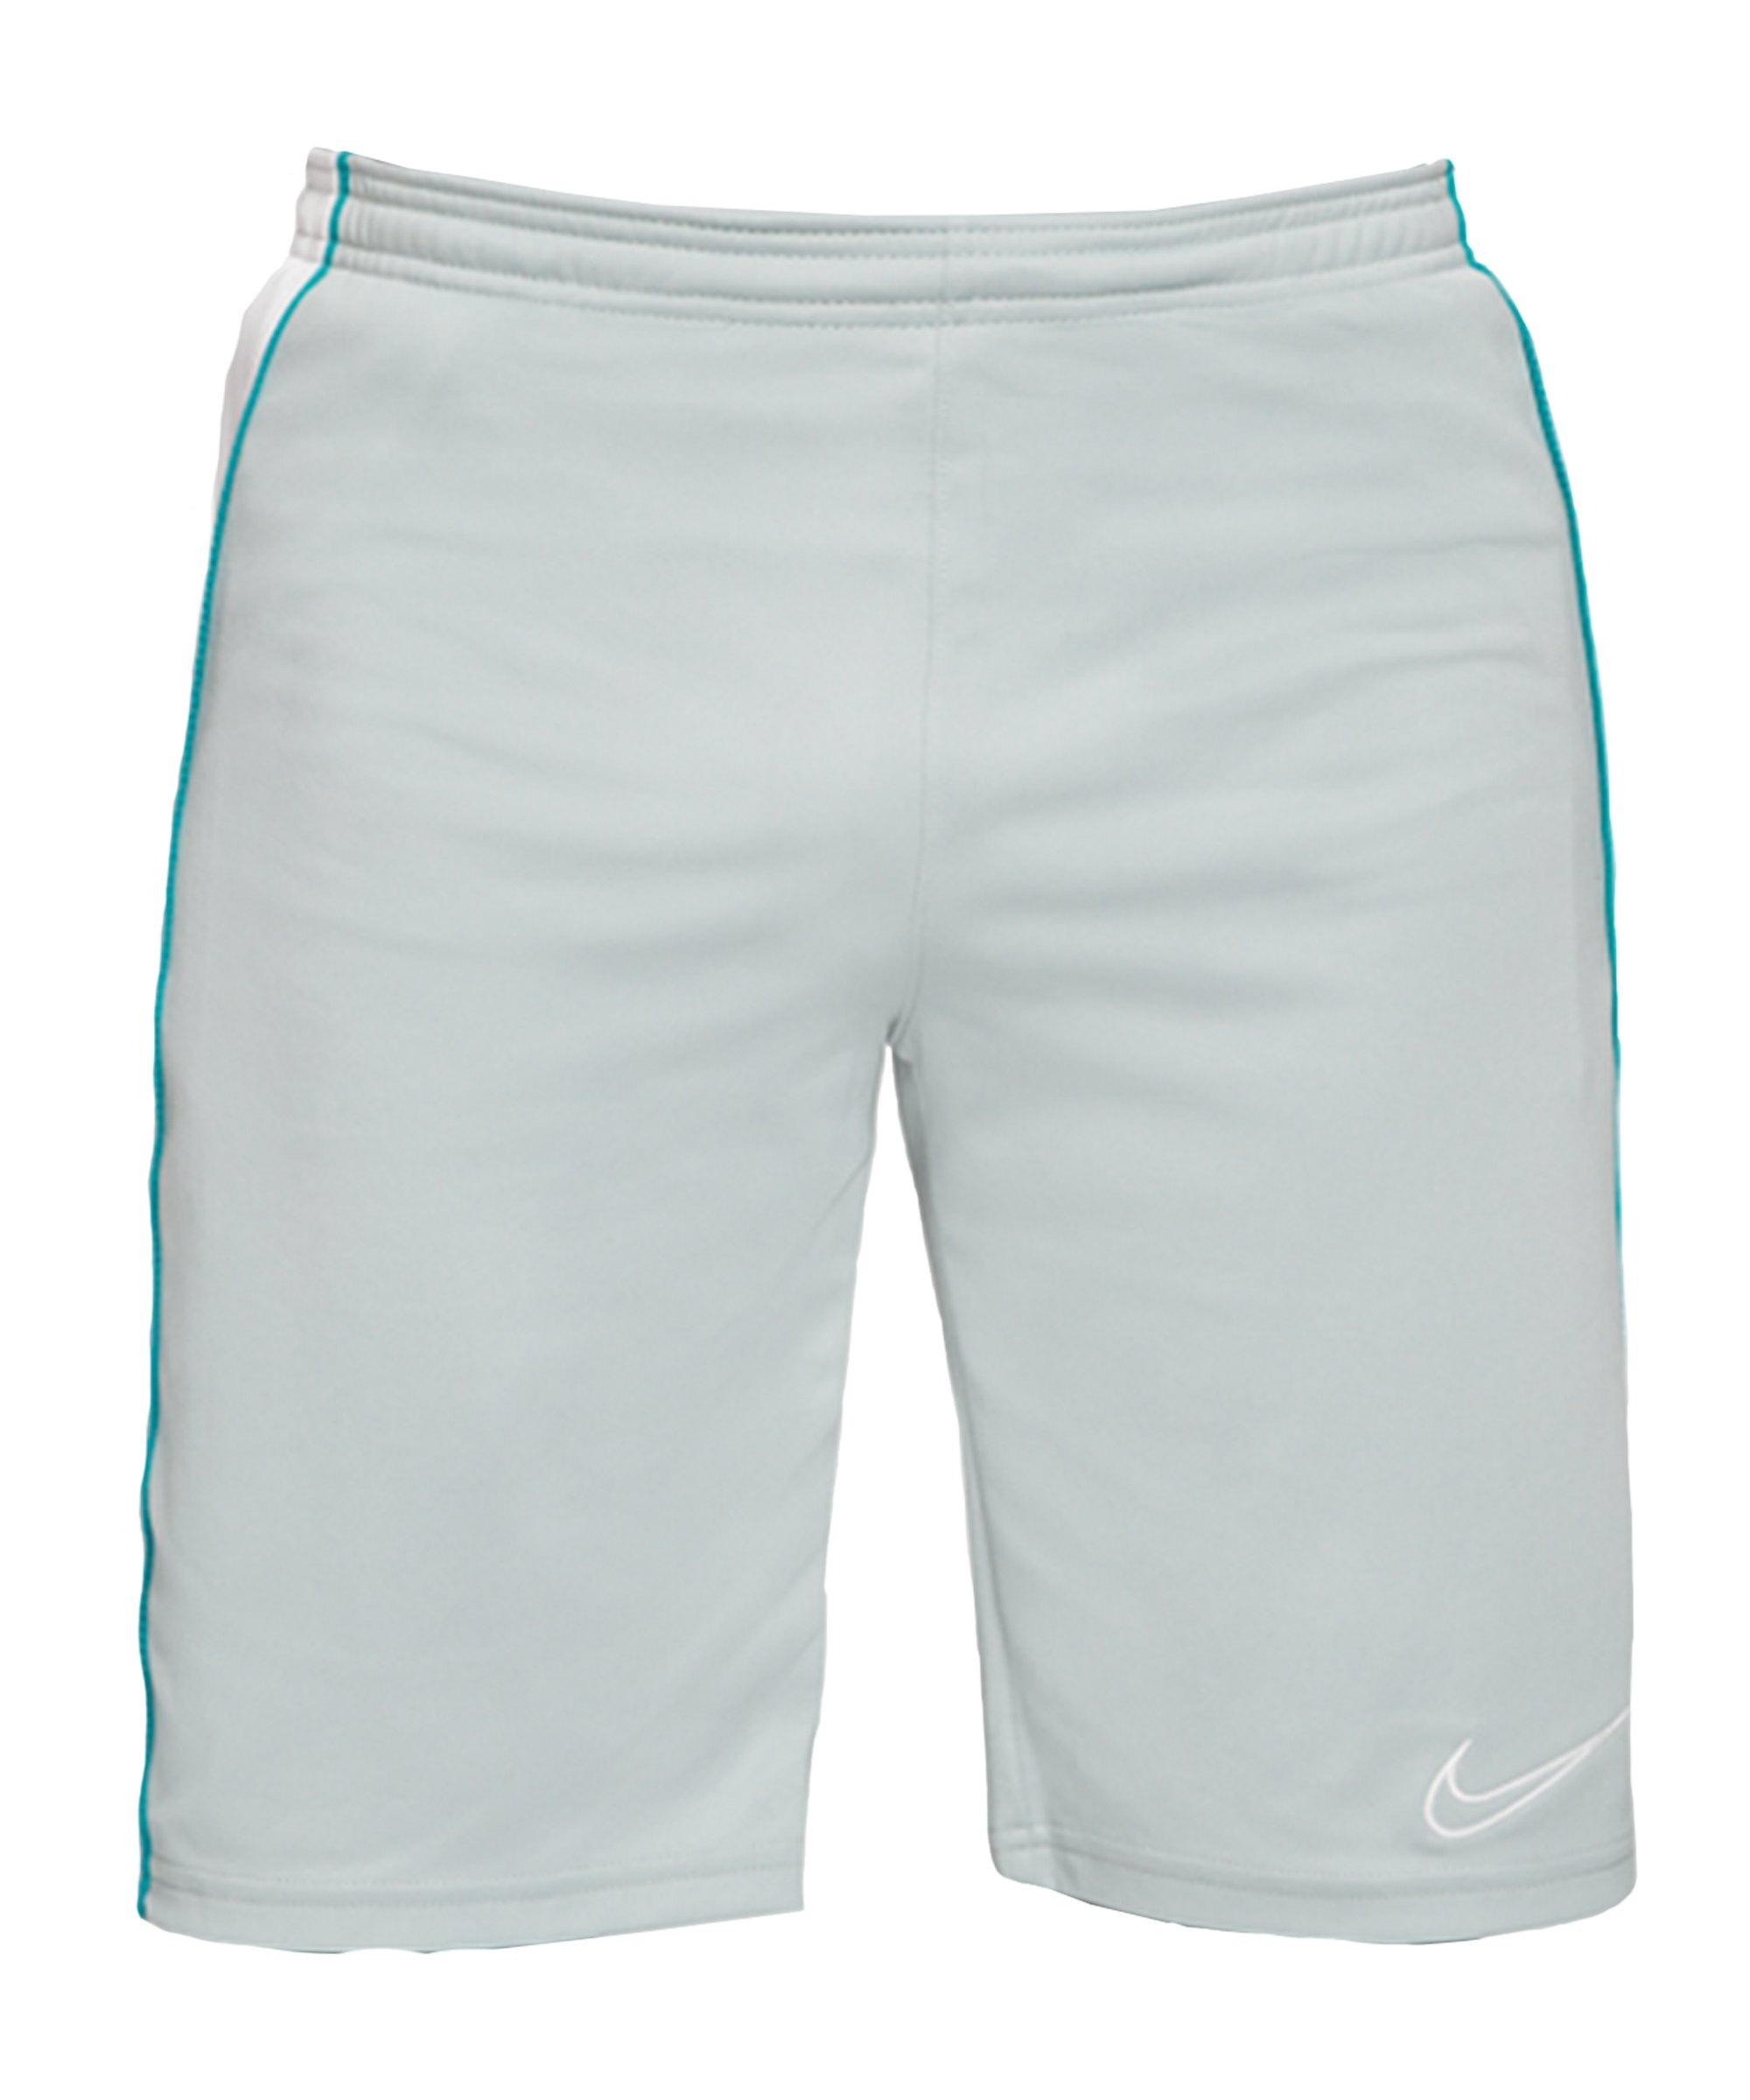 Nike Academy M18 Short Summer Artist Schwarz F019 - grau